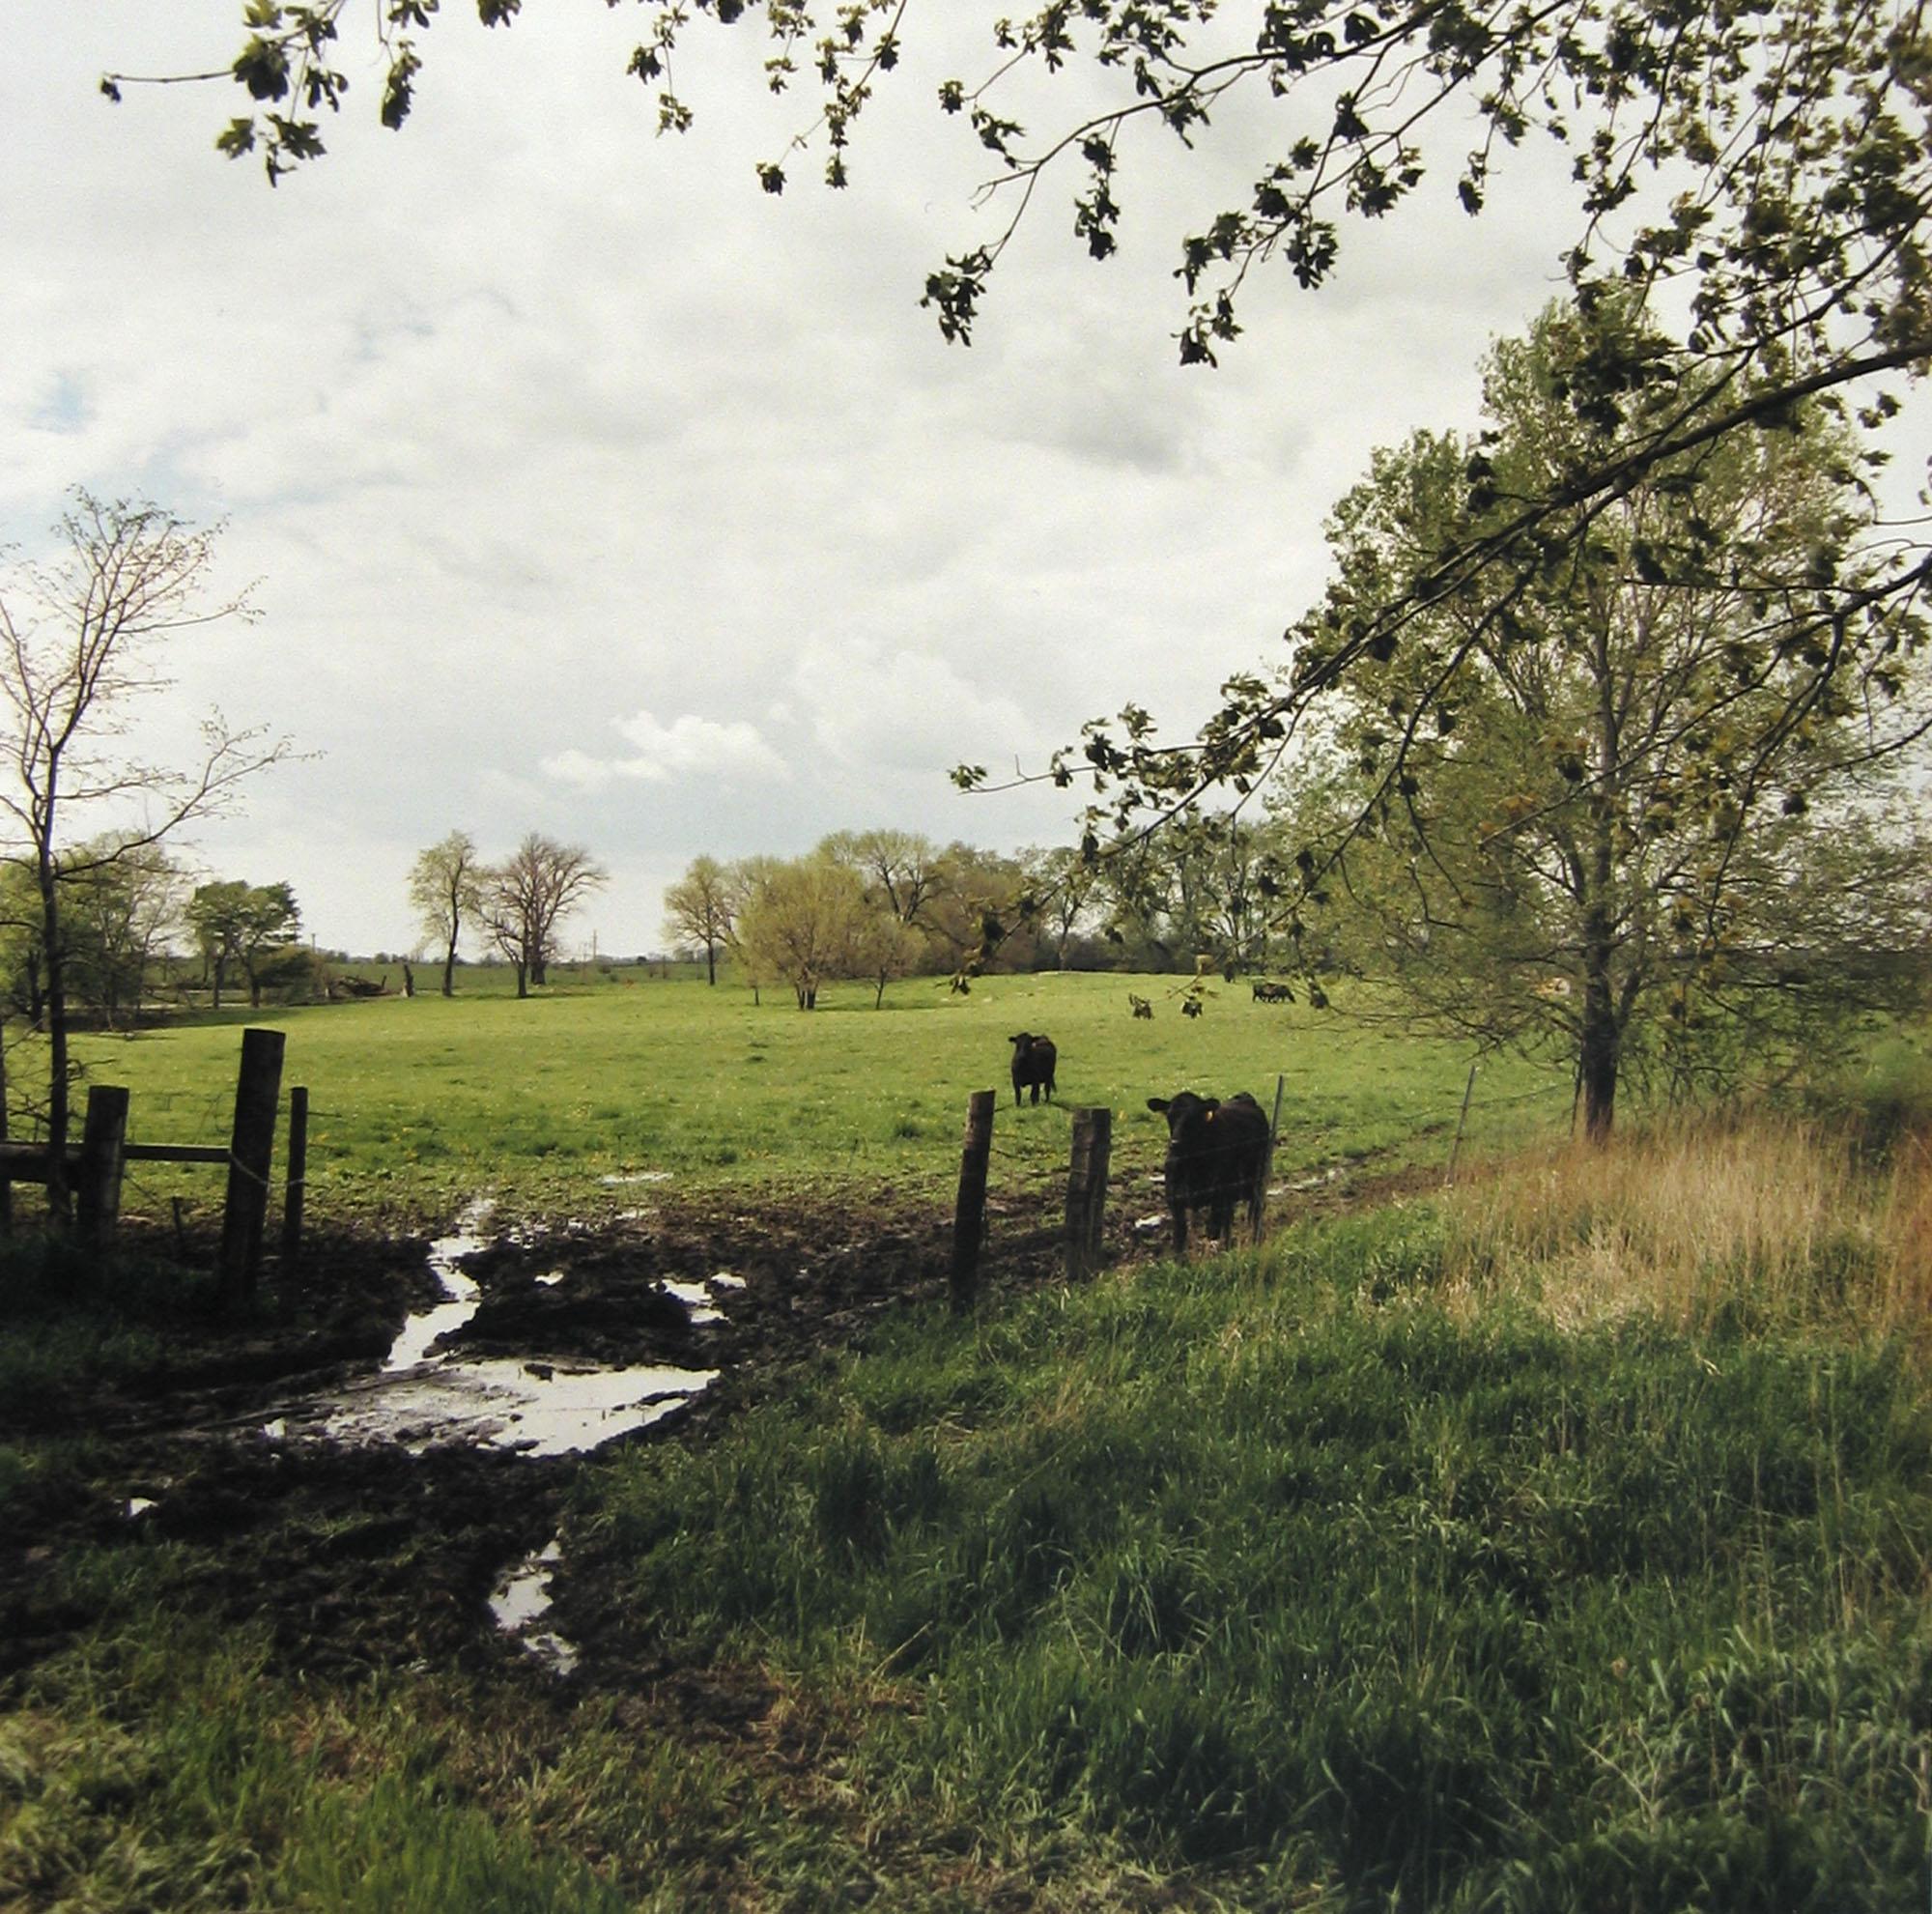 Cattle grazing, Joliet Arsenal, east side, May 1995